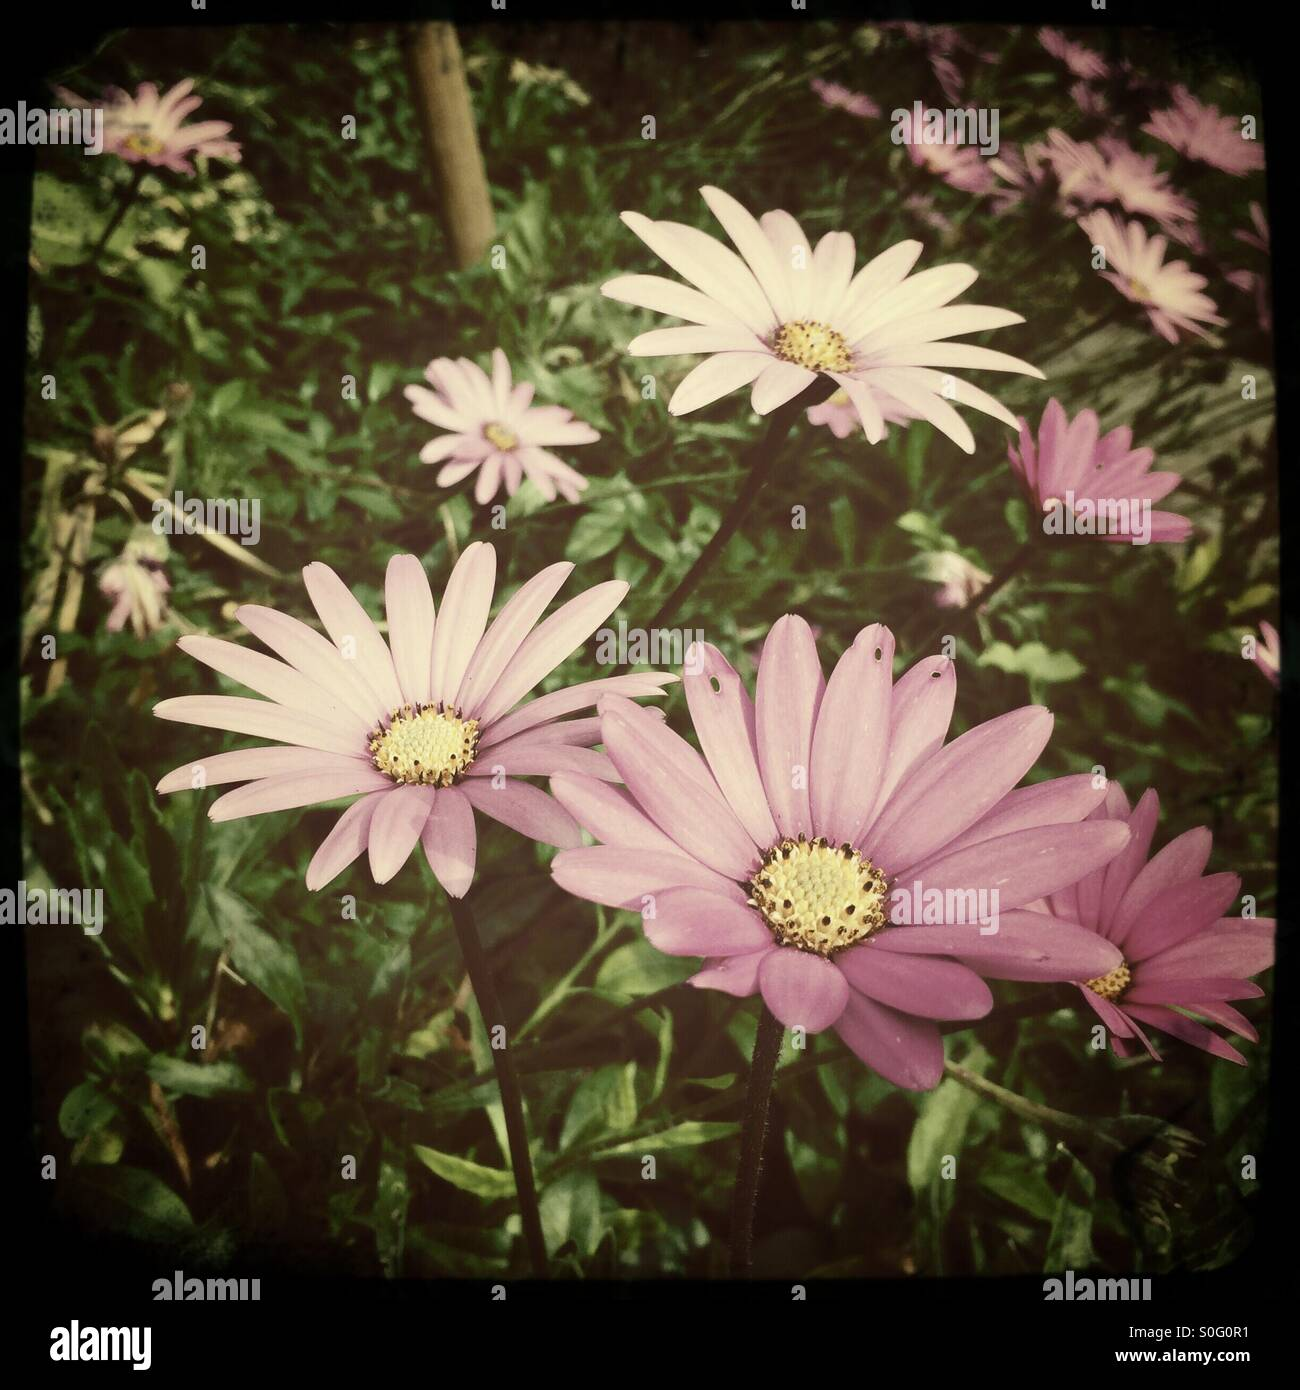 Daisy Type Flowers Stock Photo 310138501 Alamy